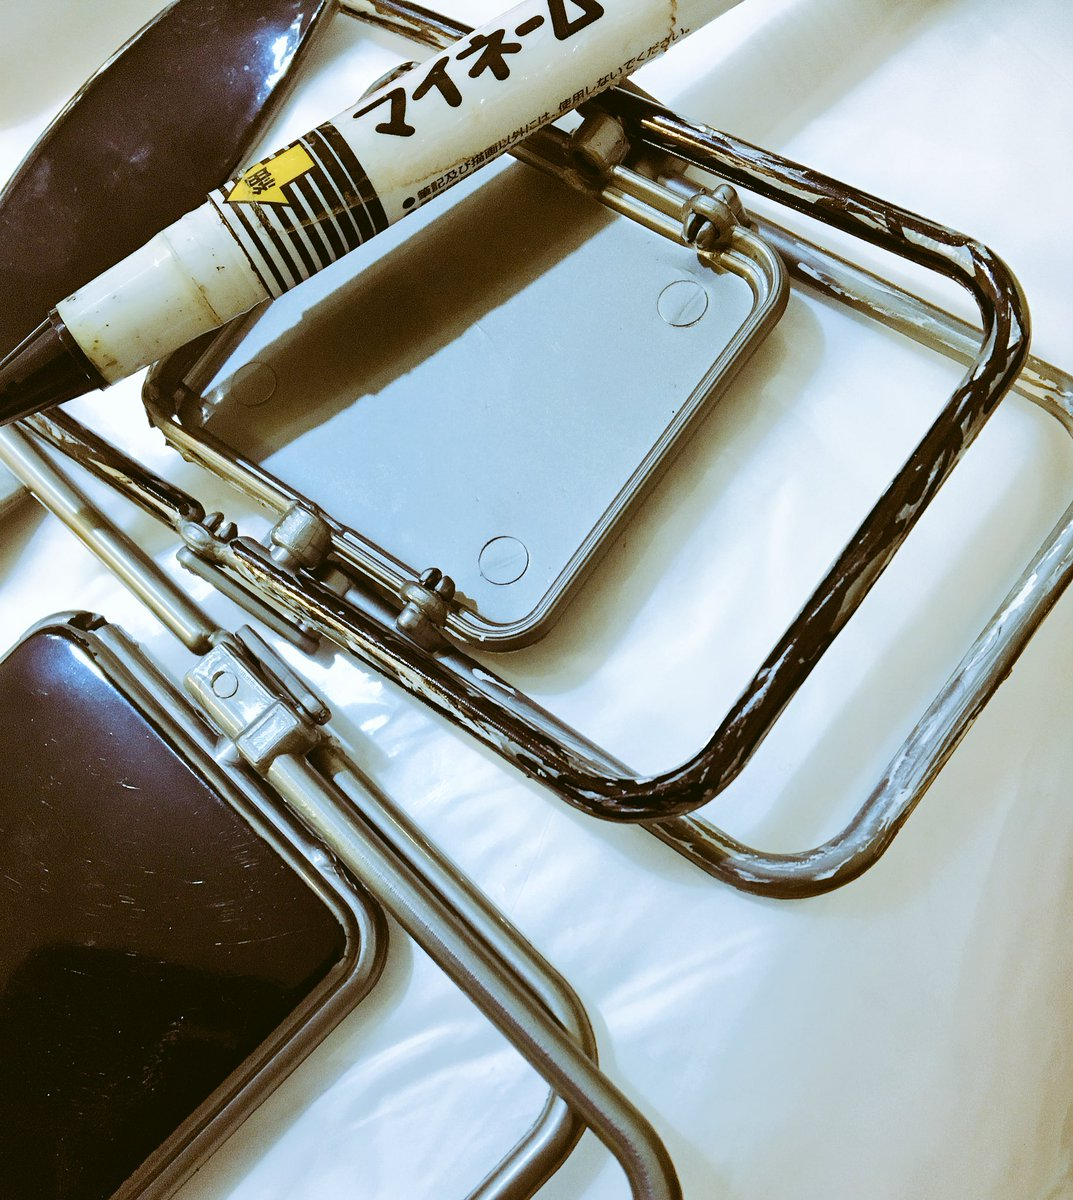 test ツイッターメディア - 今まで何人の人が、 ミニチュアパイプ椅子買ってきて 速攻ダメージ加工してきたんだろう…  仲間入りが嬉しい。 無事にできるか?  #キャンドゥ #男椅子 #作成中 https://t.co/KaJtvKovxb